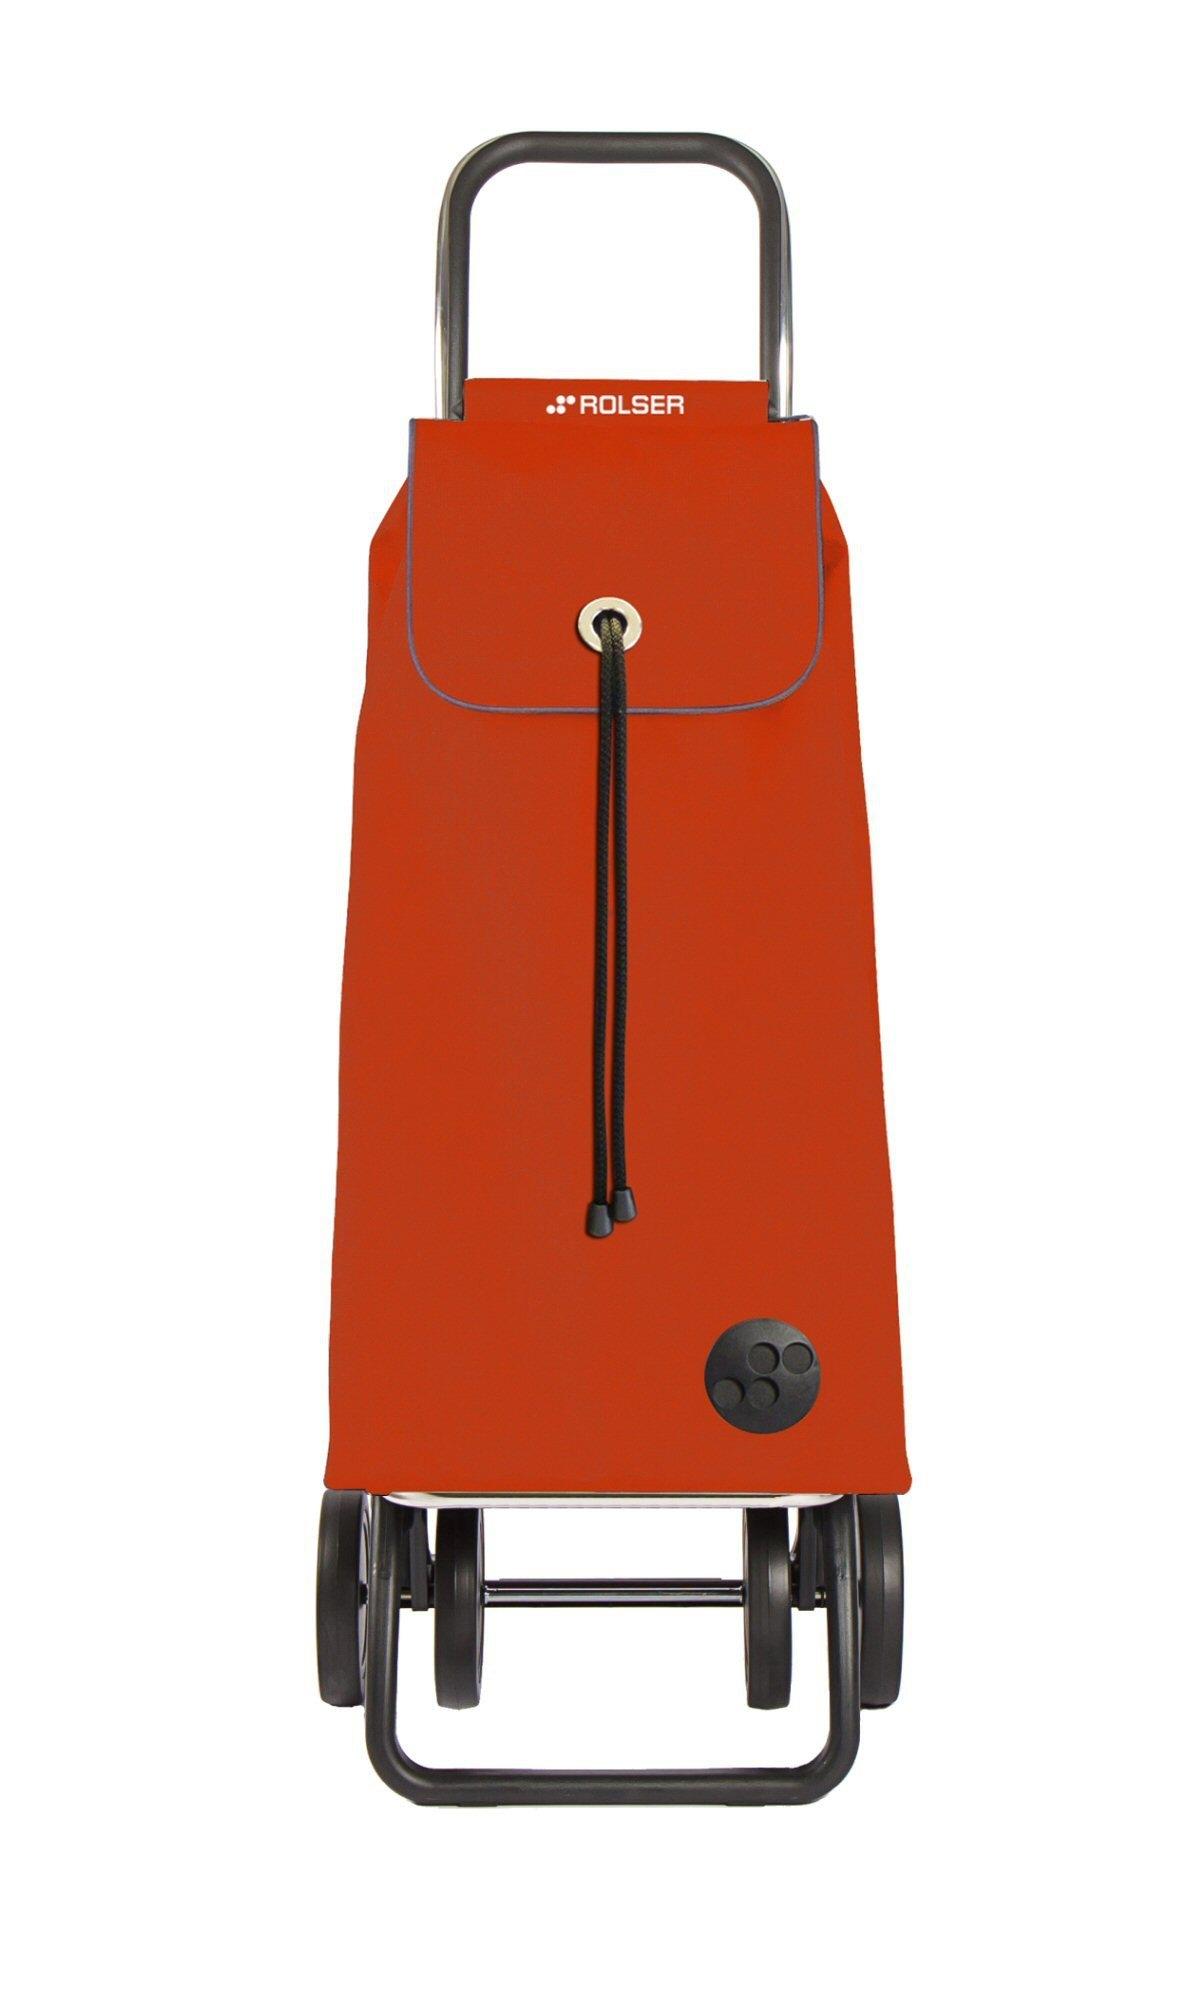 carro-de-compra-i-max-mf-2+2 rojo - Mas Masia carros